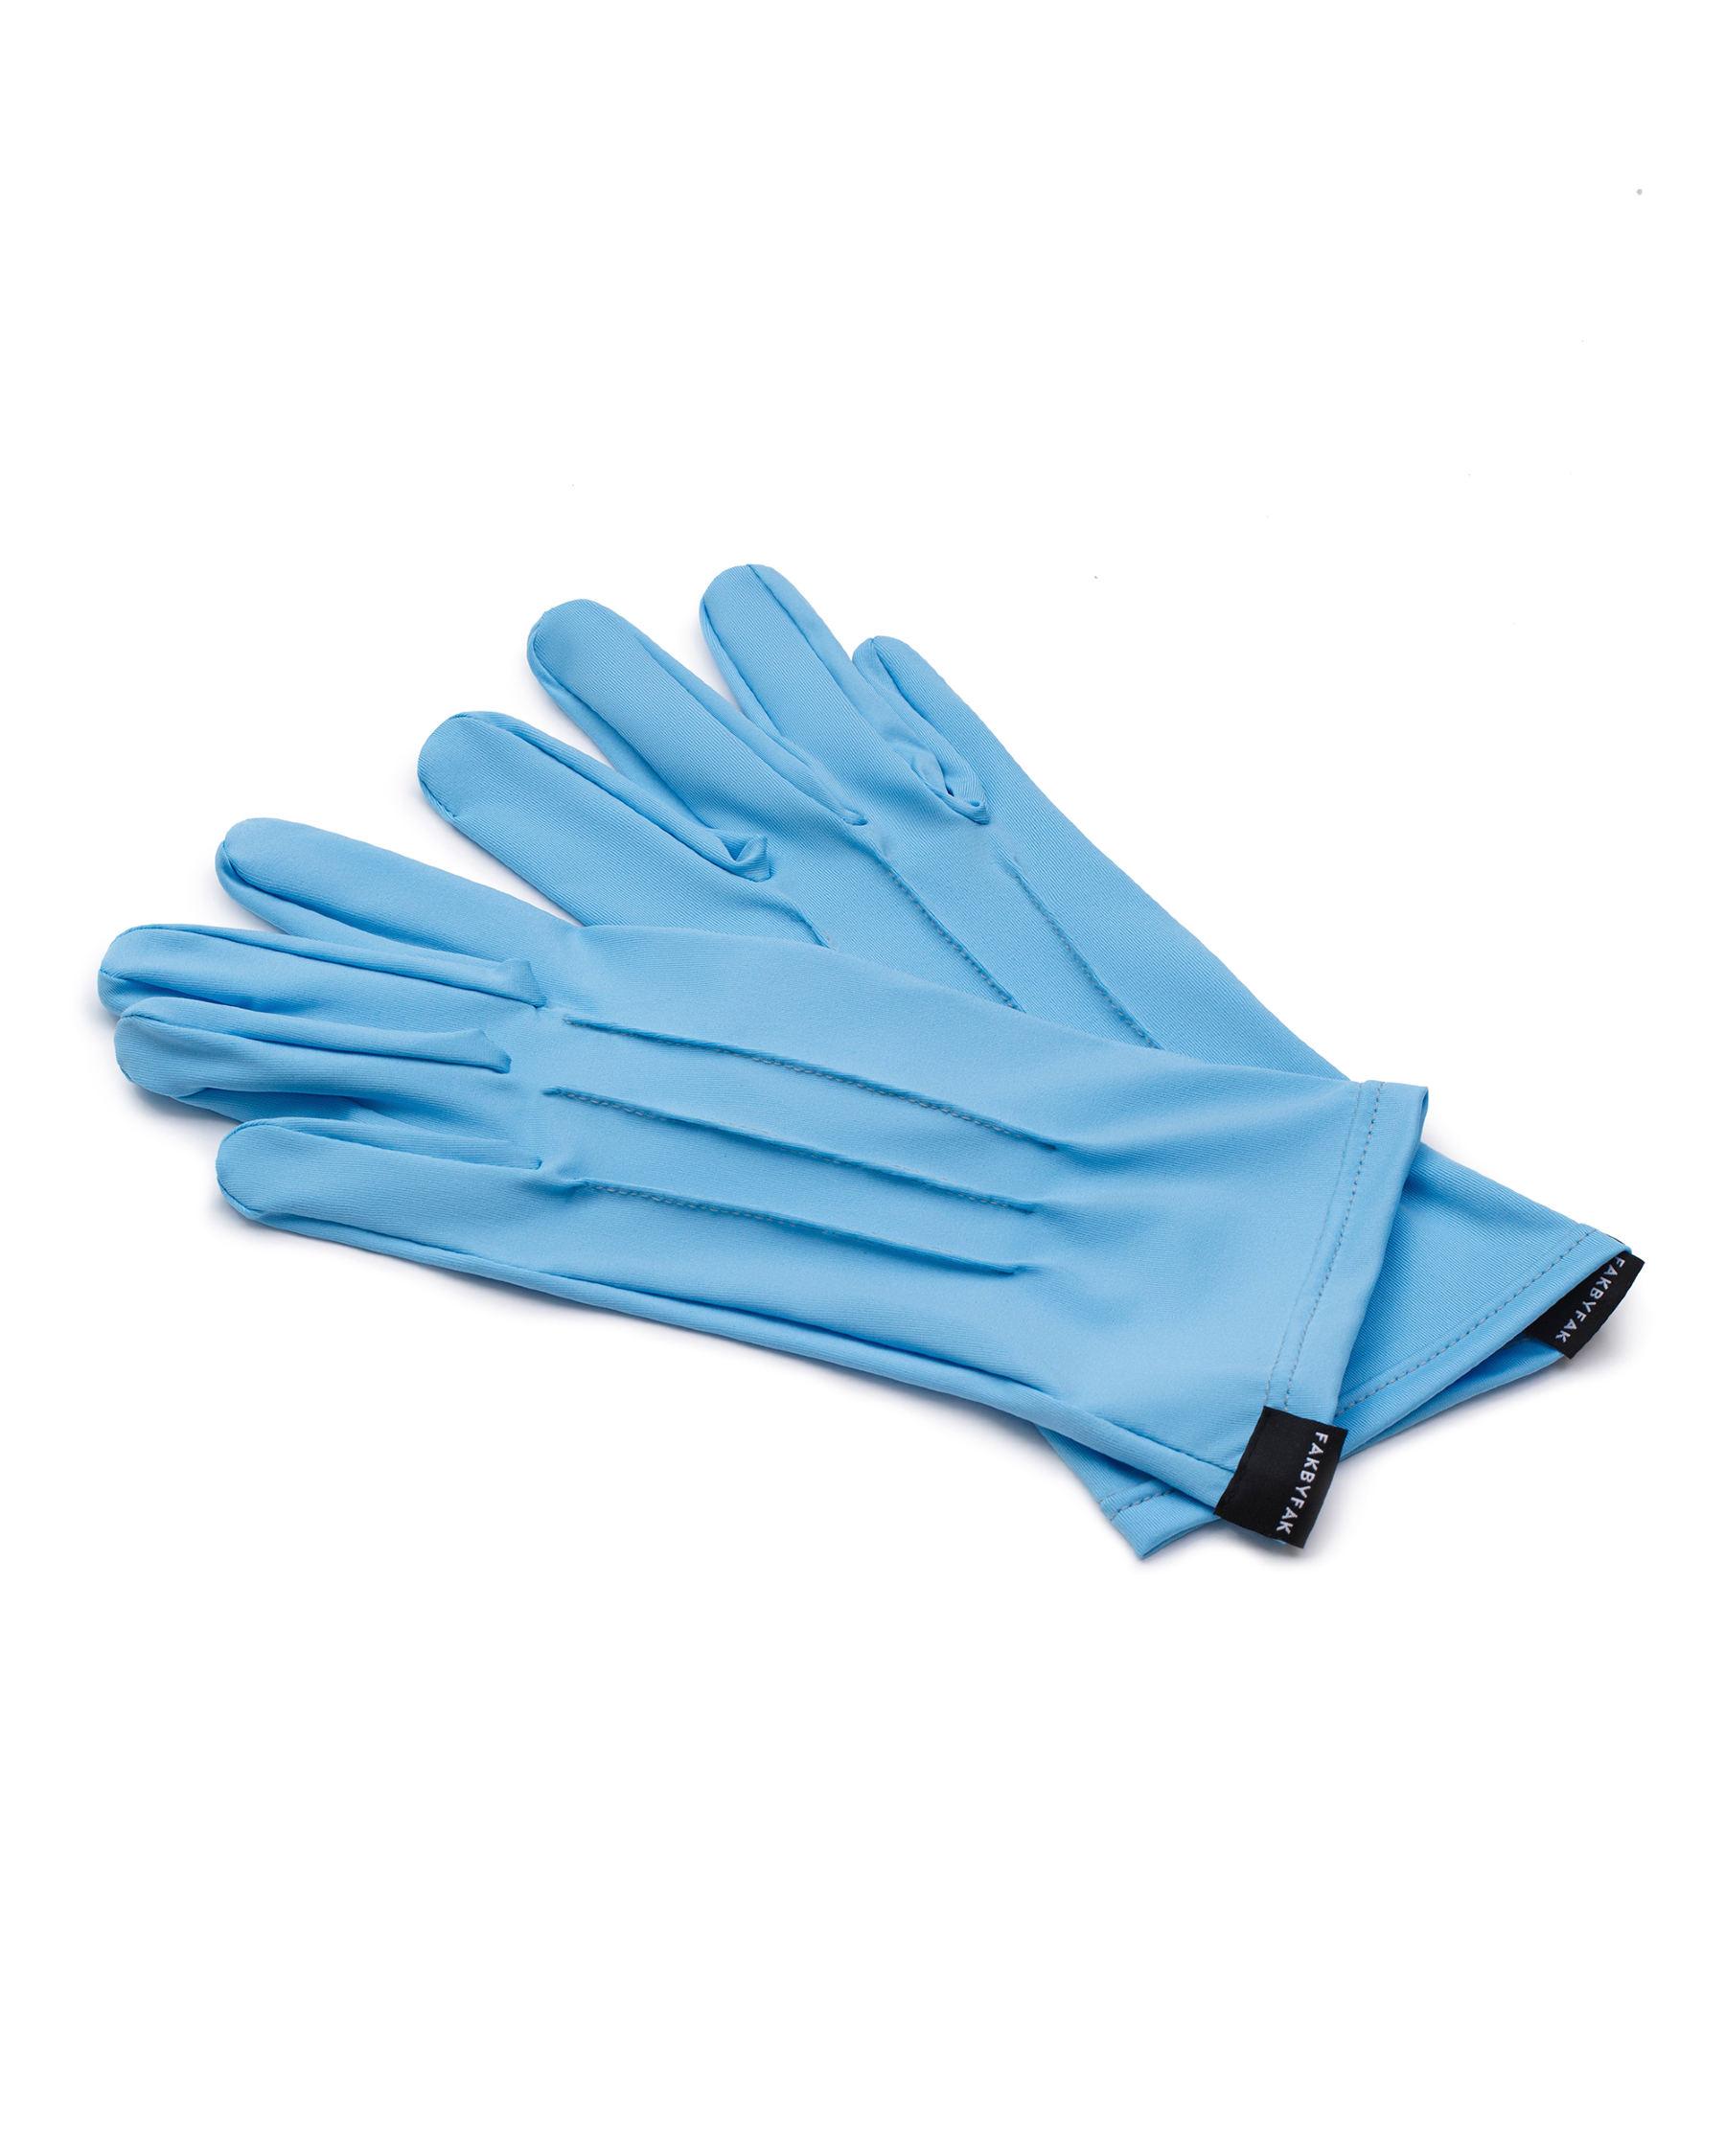 FAKBYFAK  The Vega. Fine Protective Antibacterial (ATB-UV+) Unisex Gloves. Light Blue Code: FBF-41101-05